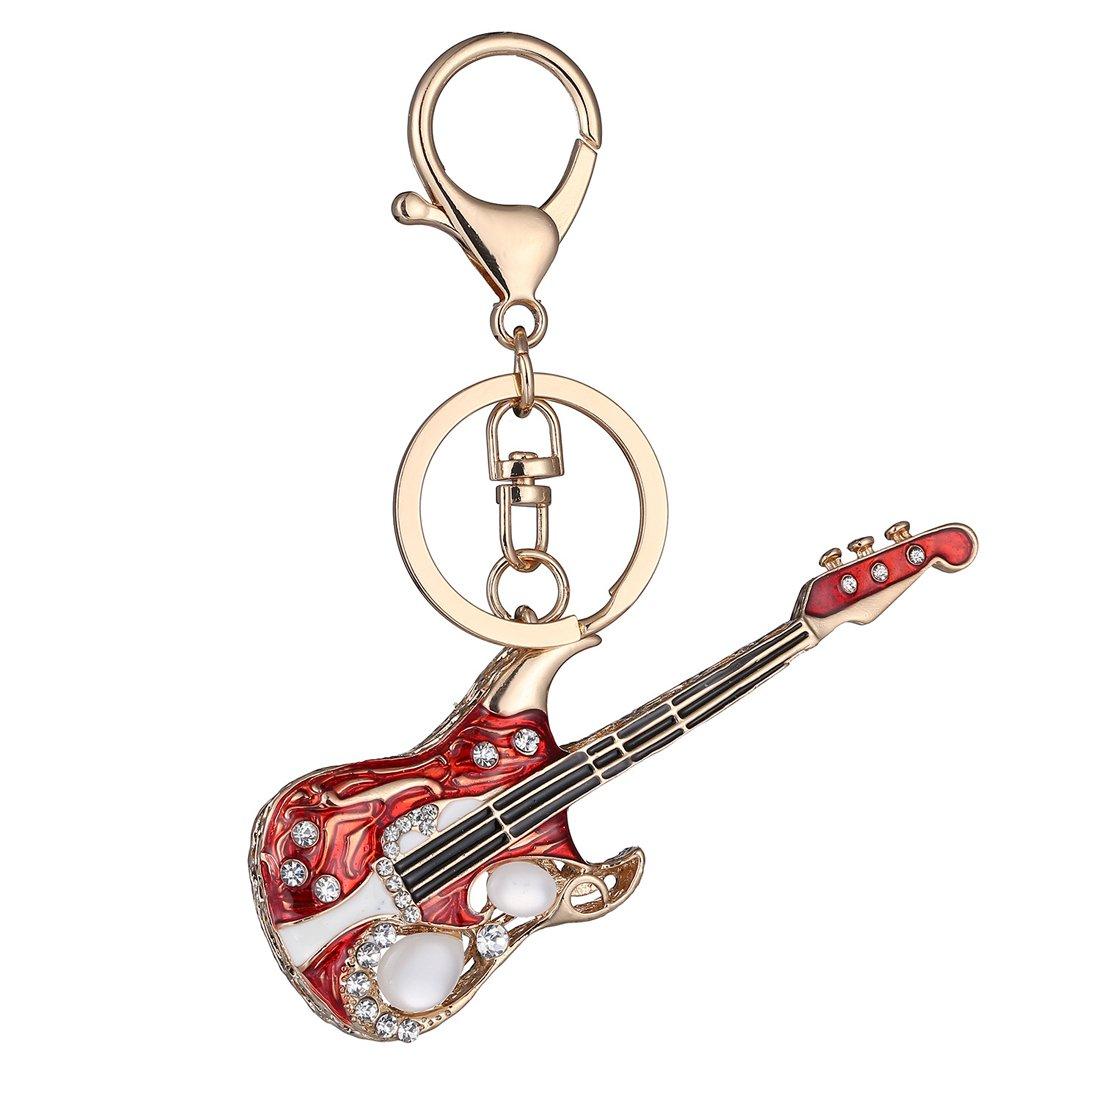 JJTZX Acoustic Guitar Keychain/Keyring Rock Star Keychain Perfect Music Teacher Gift